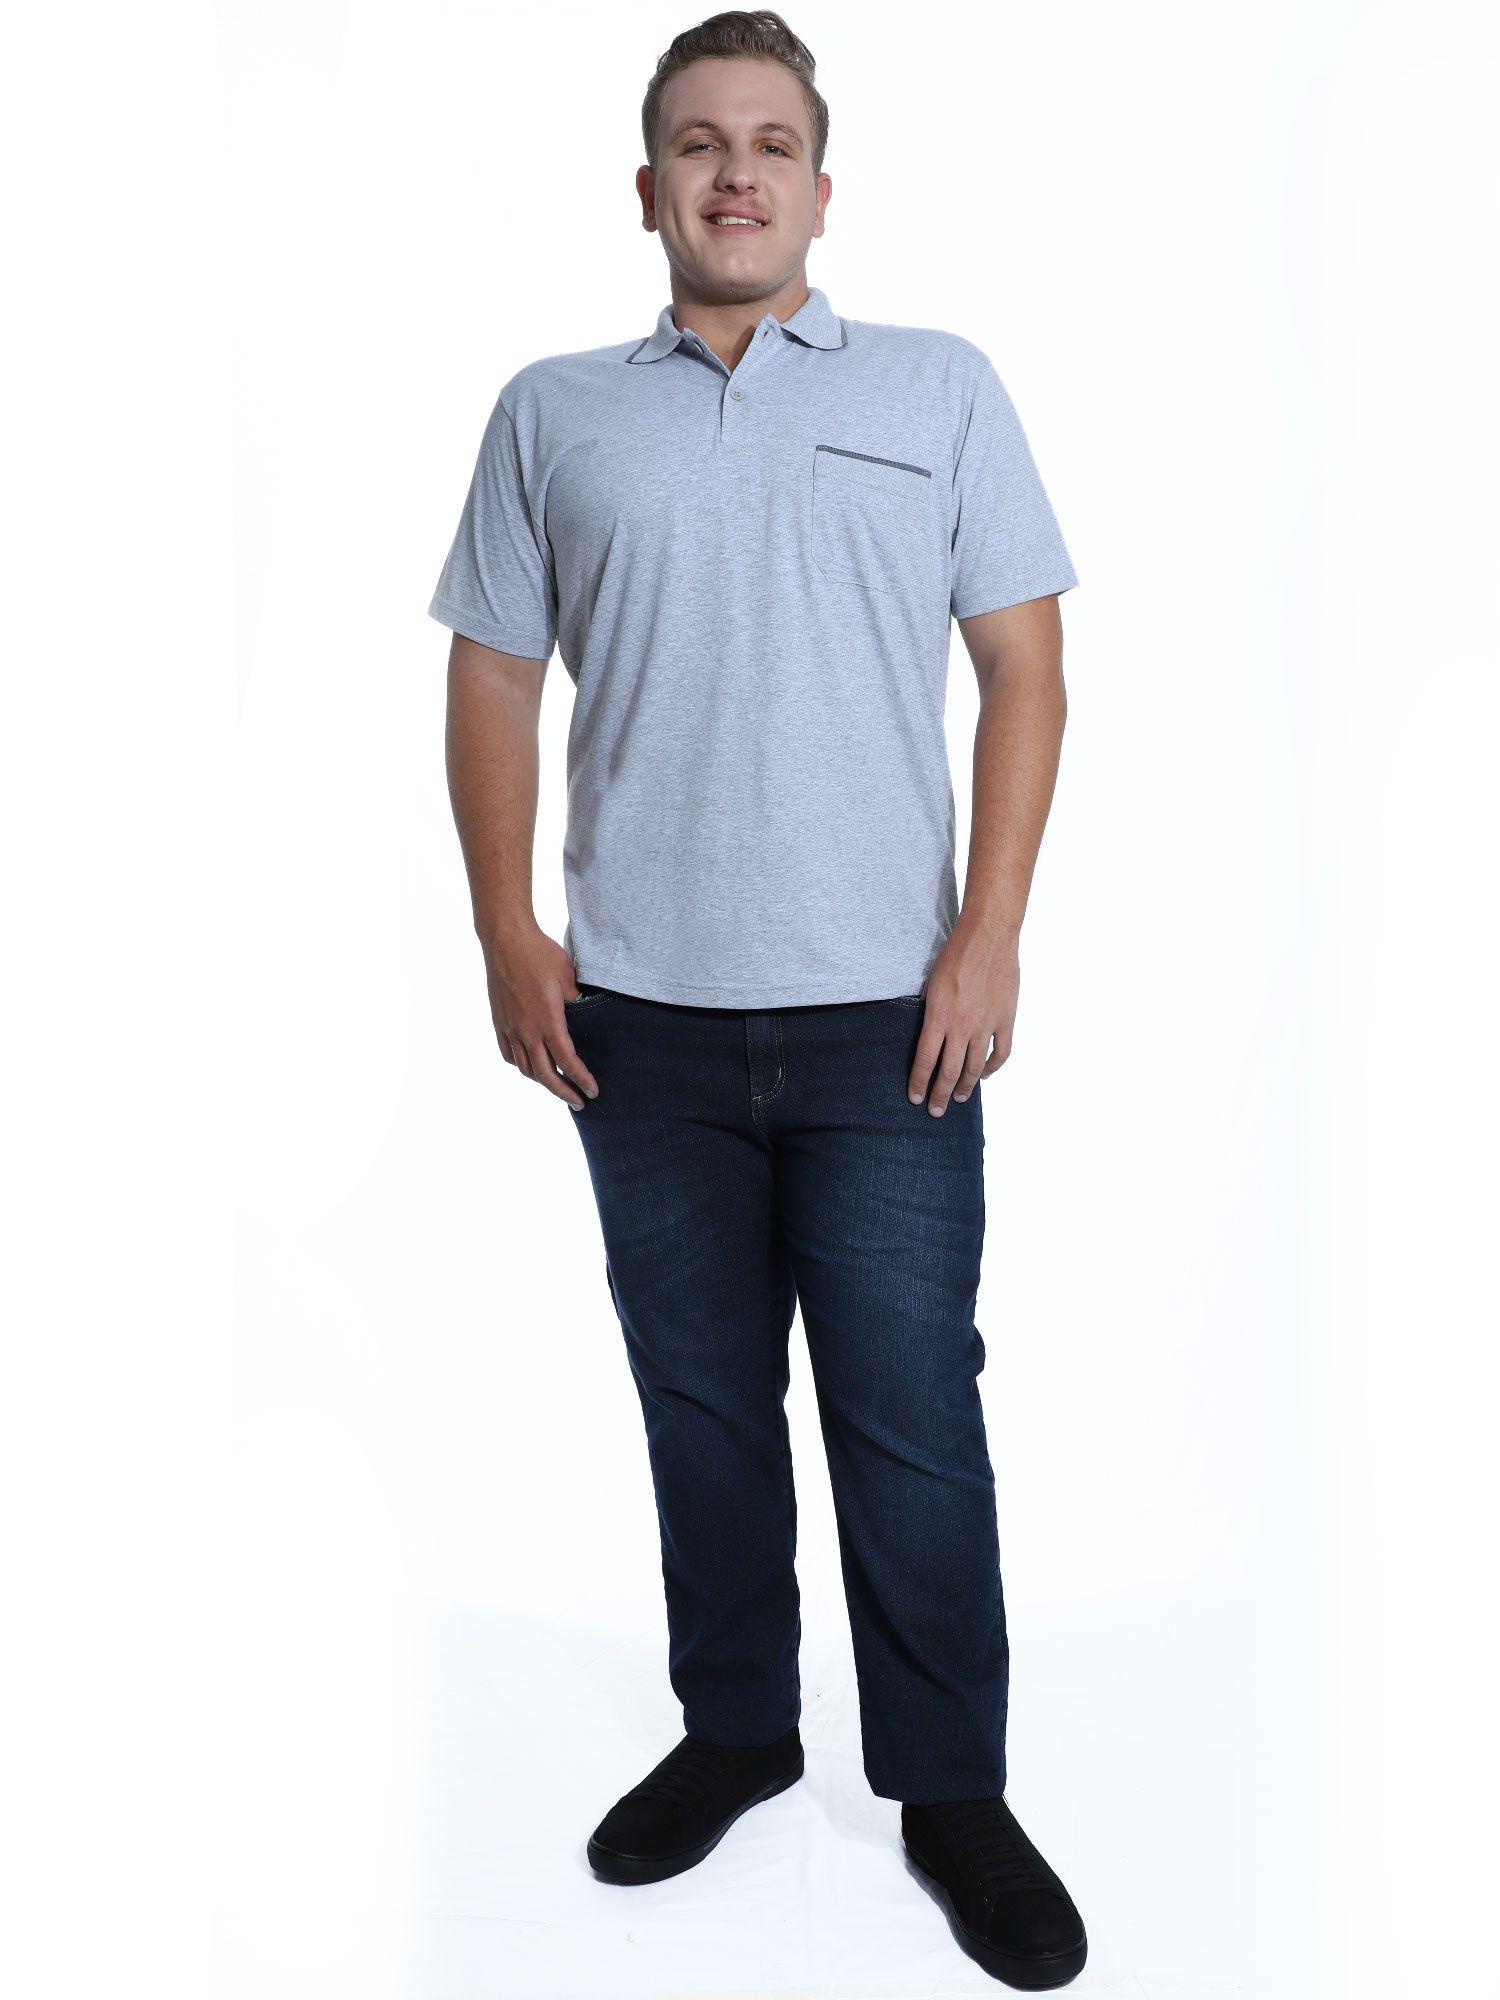 Camisa Polo Anistia com Bolso e Retilínea Mescla Claro